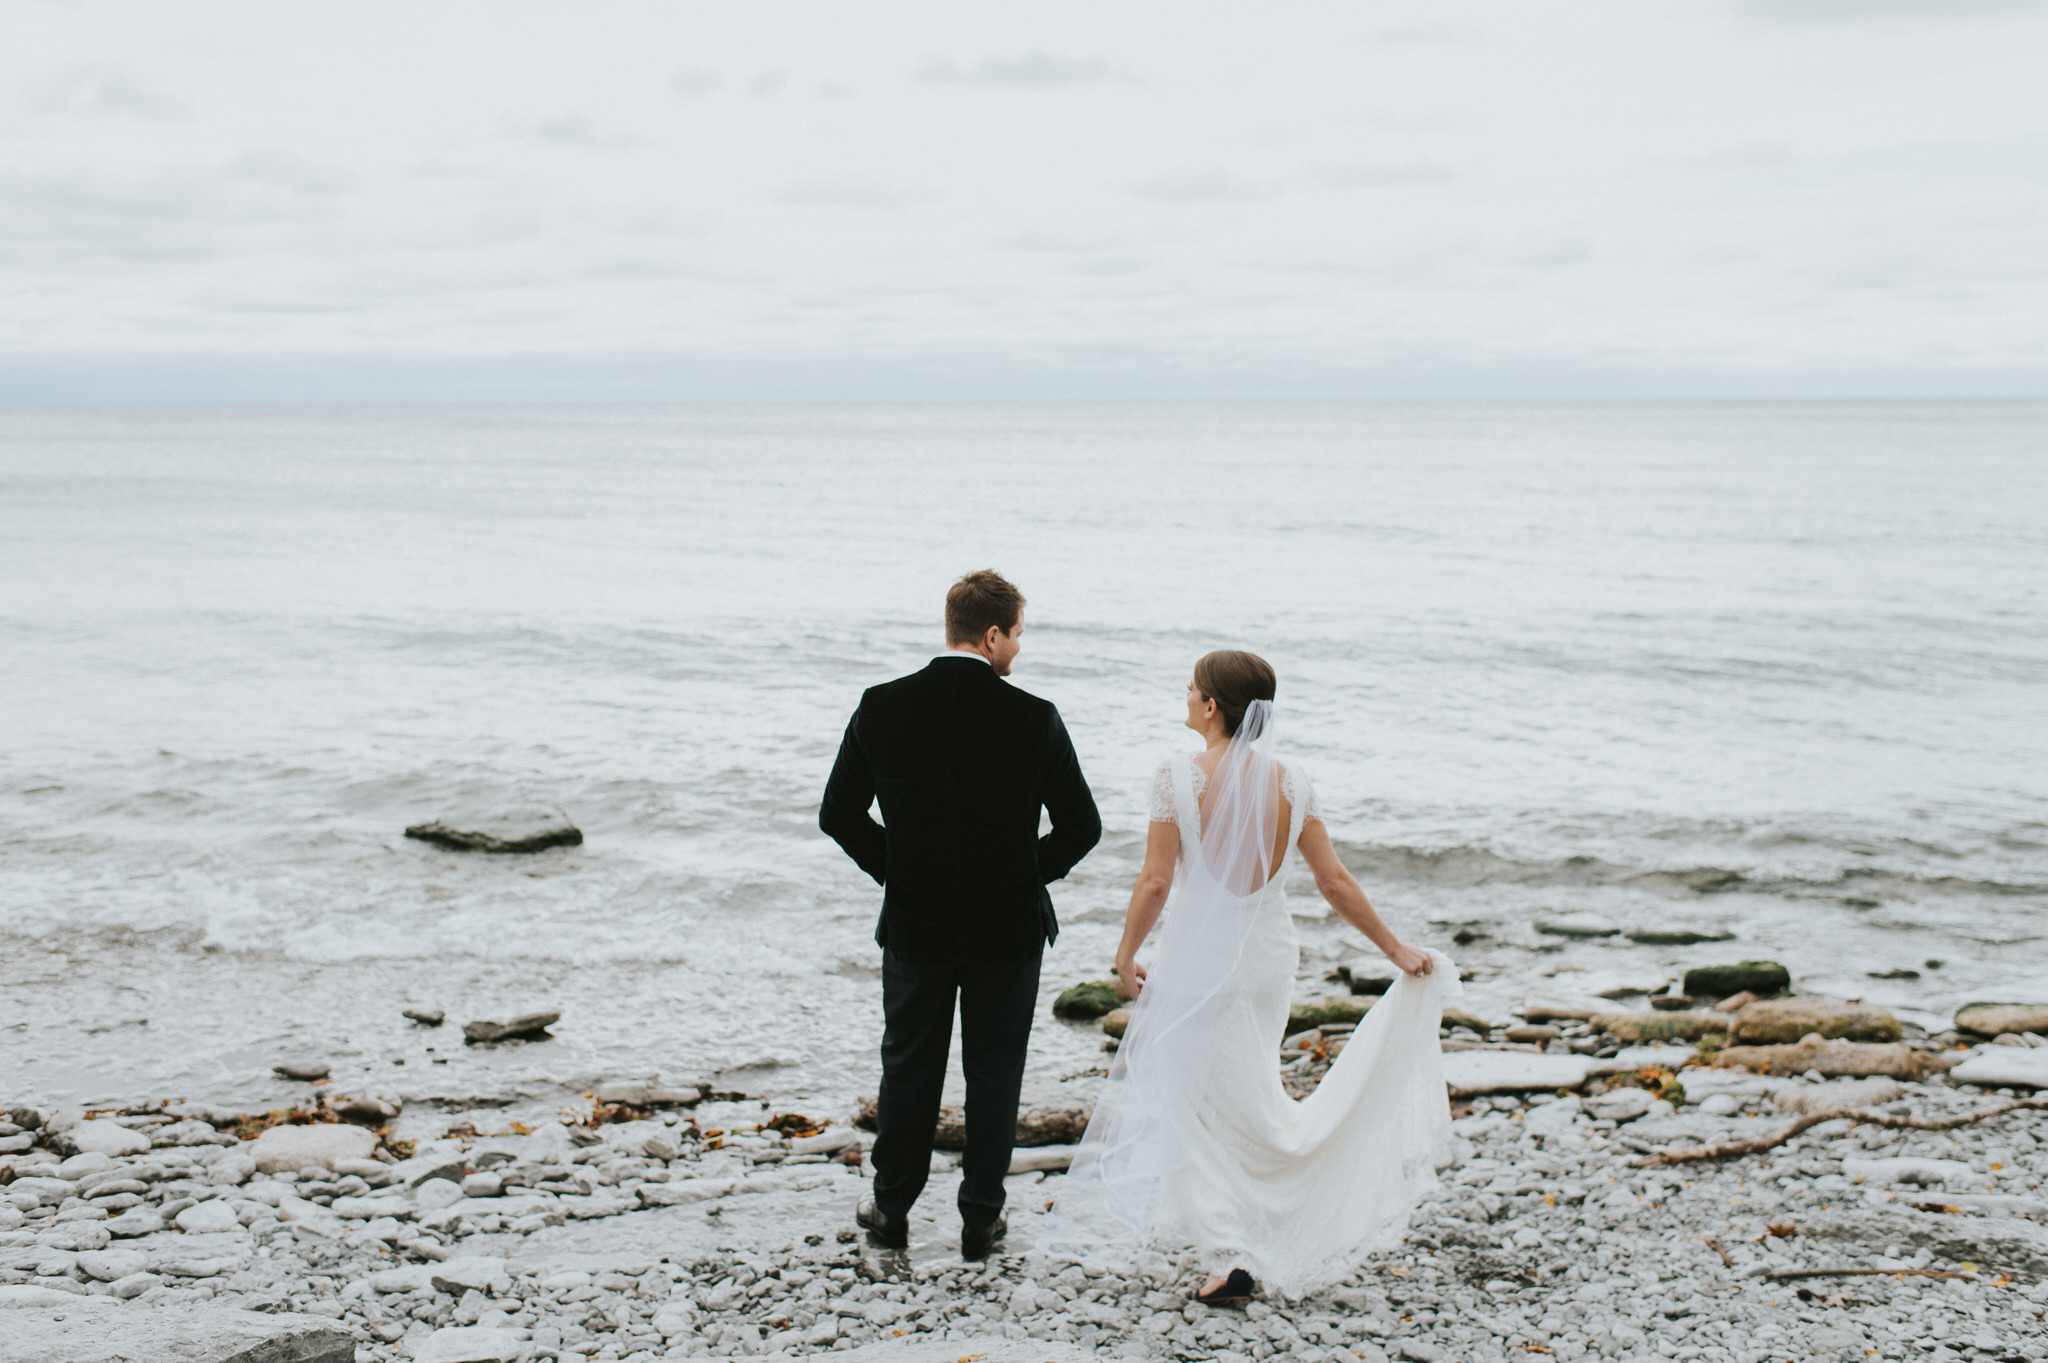 scarletoneillphotography_weddingphotography_prince edward county weddings035.JPG